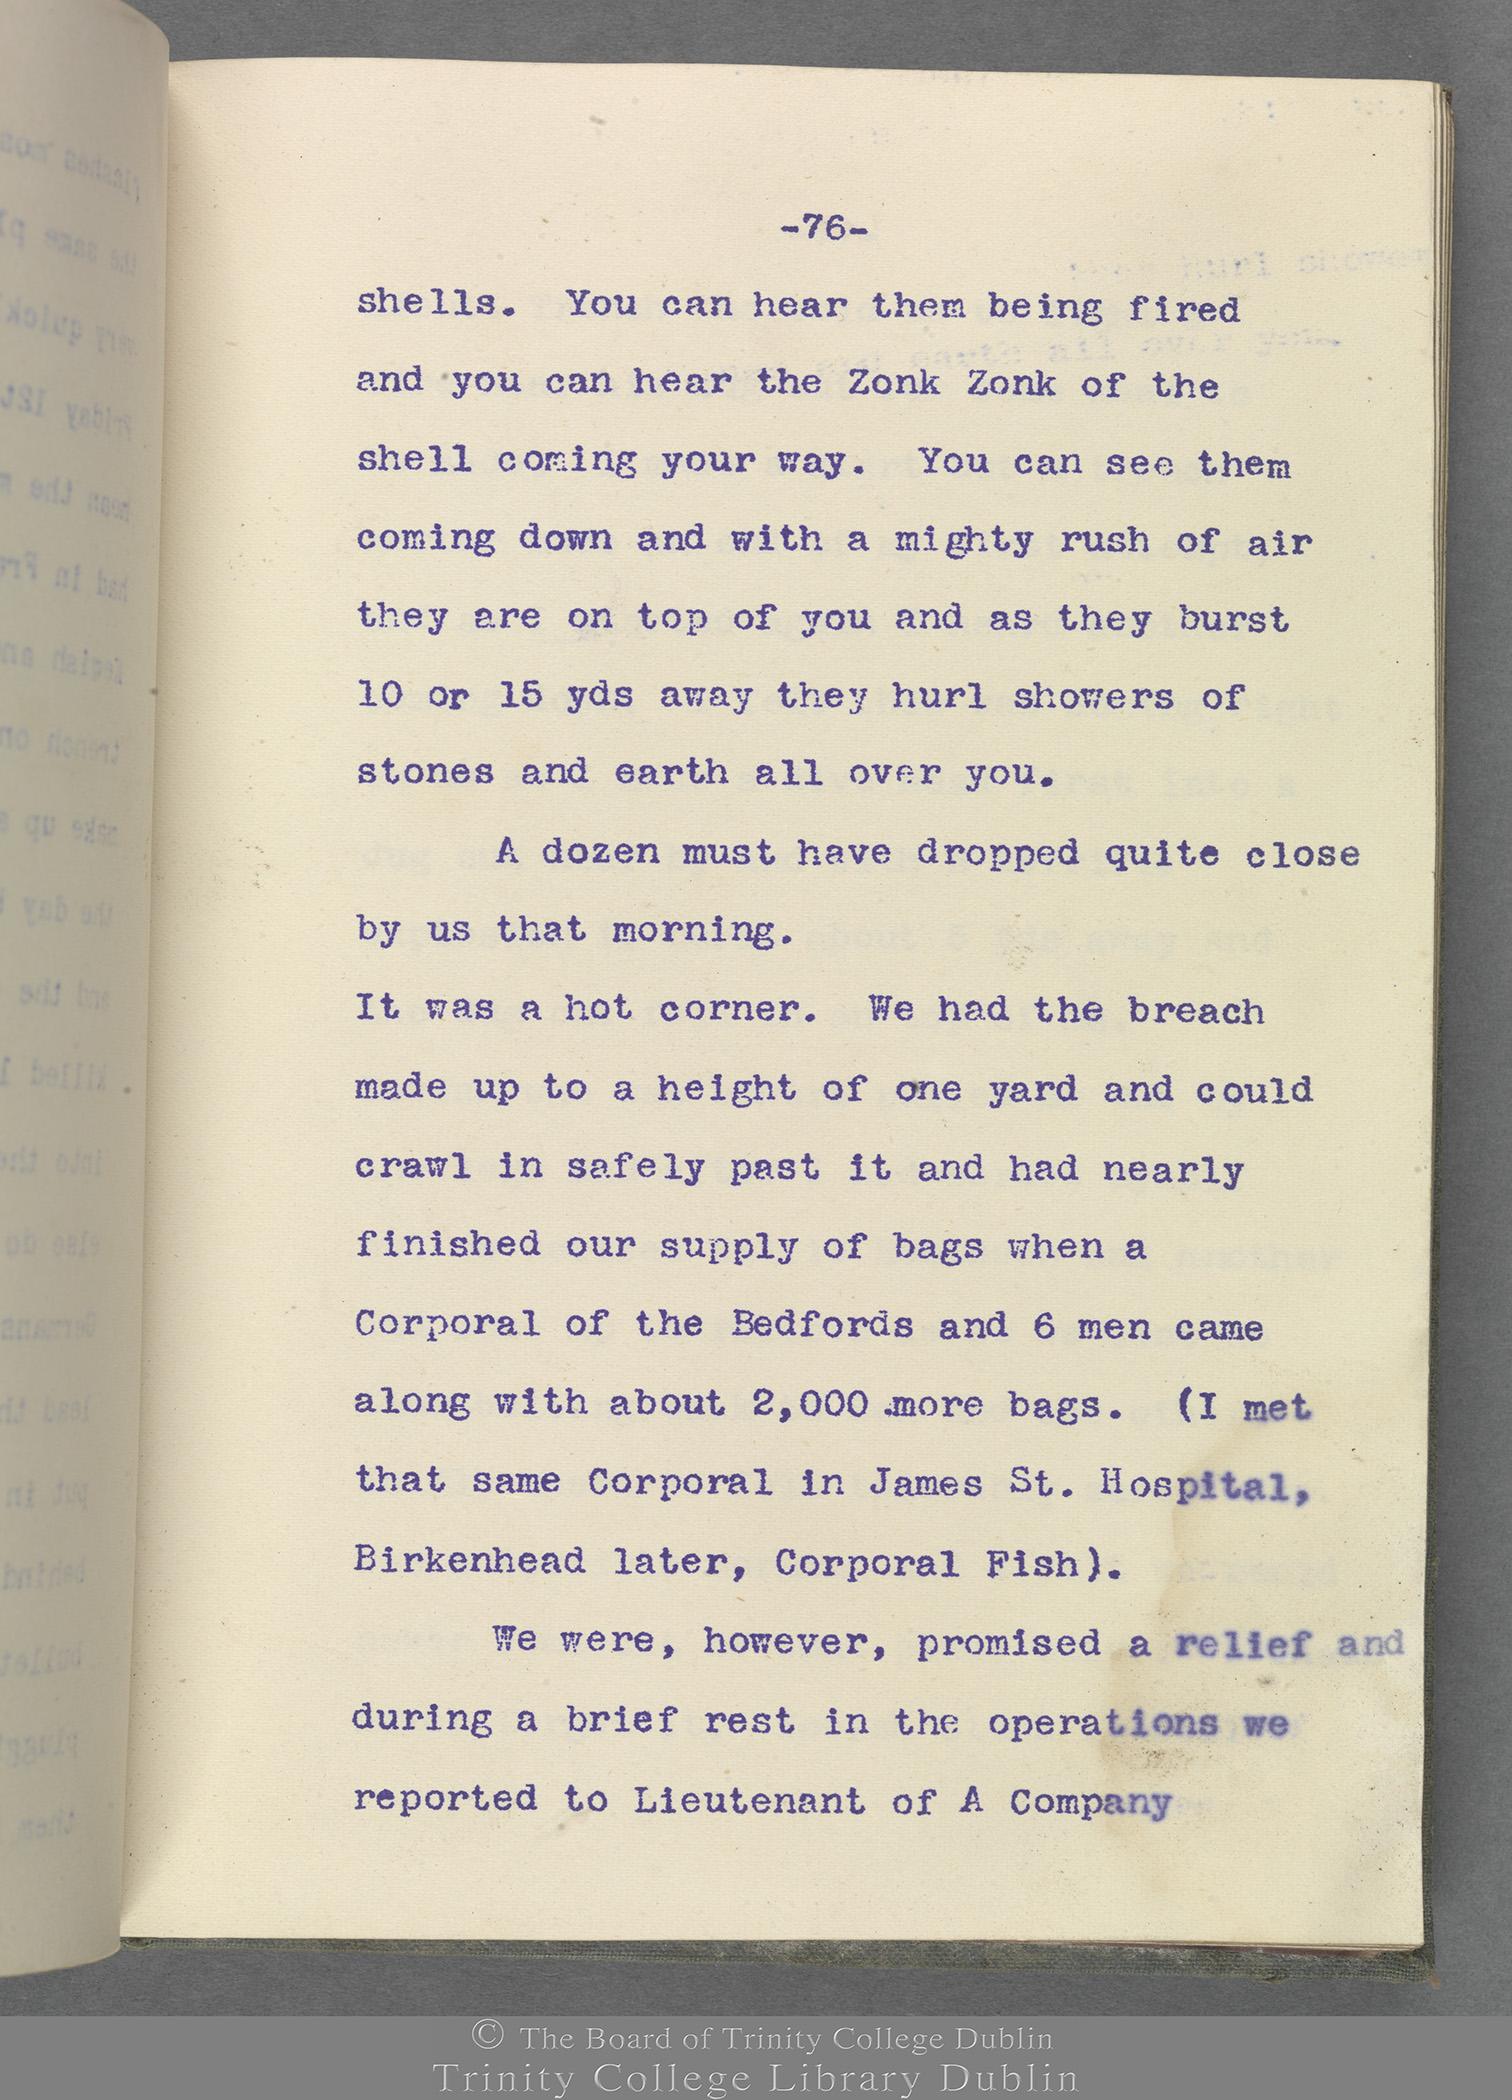 TCD MS 10853 folio 76 recto